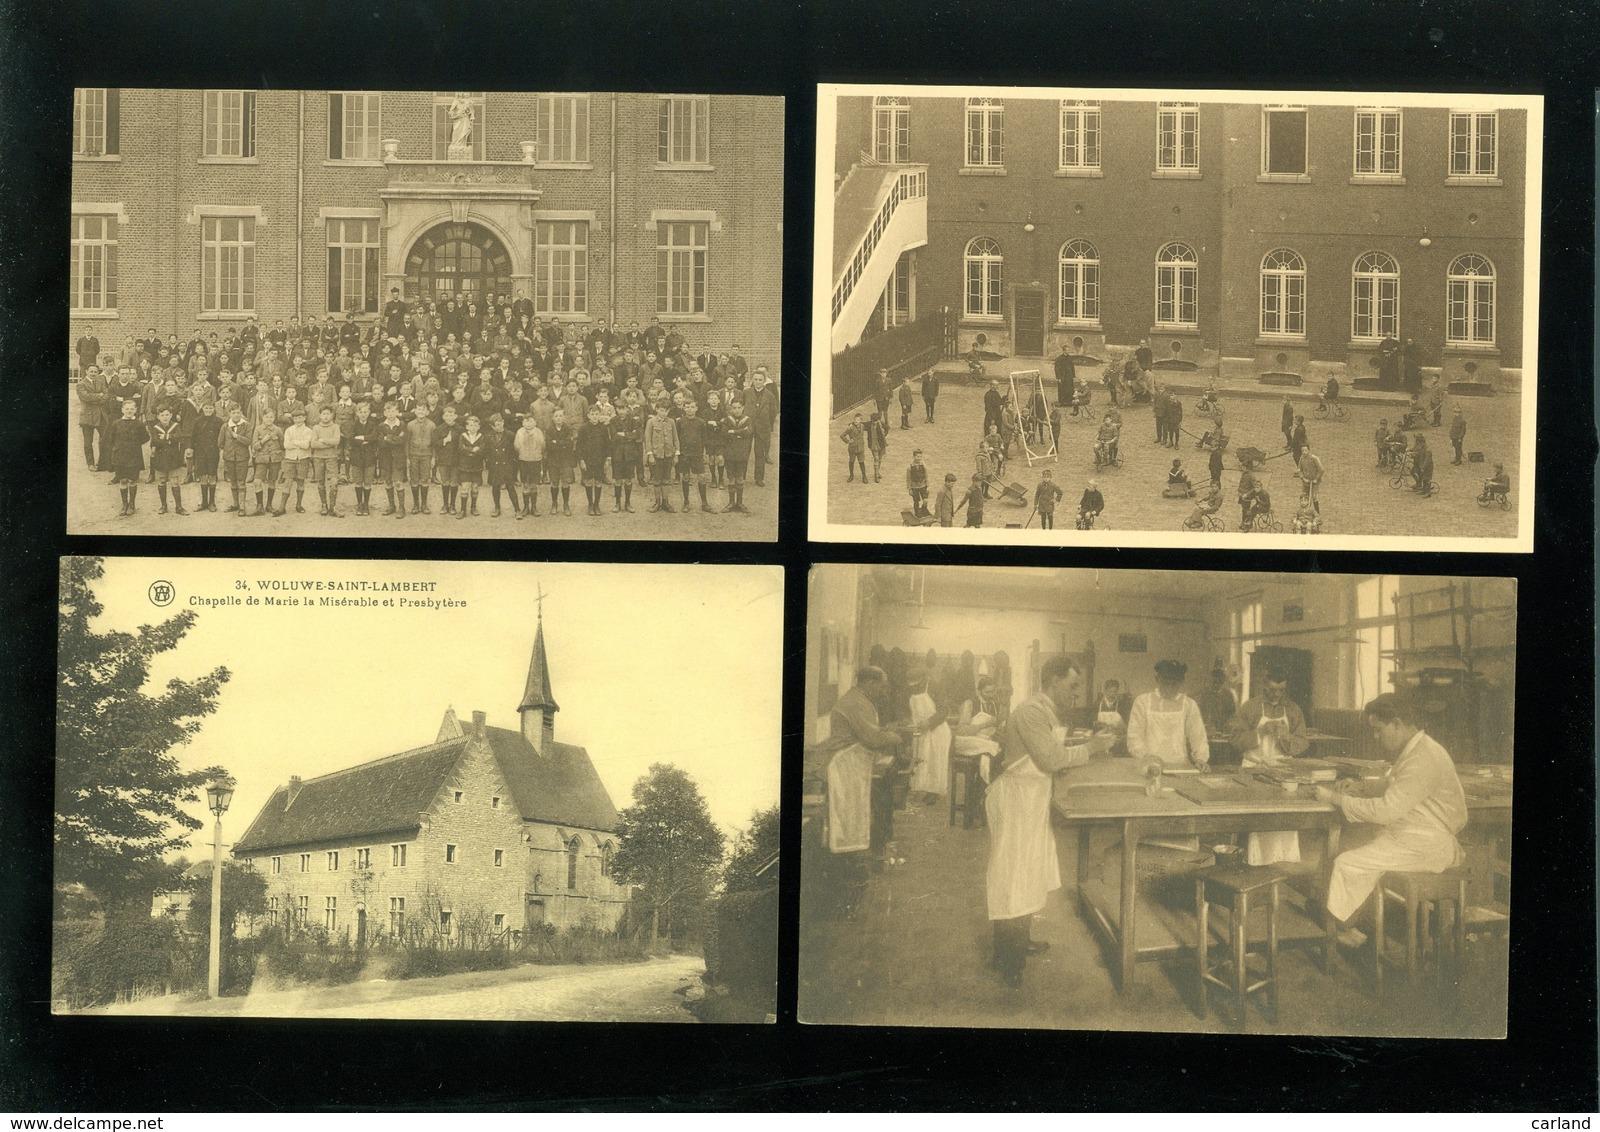 Beau Lot De 40 Cartes Postales De Bruxelles  Woluwé  Mooi Lot Van 40 Postkaarten Van Brussel  Woluwe - Postkaarten